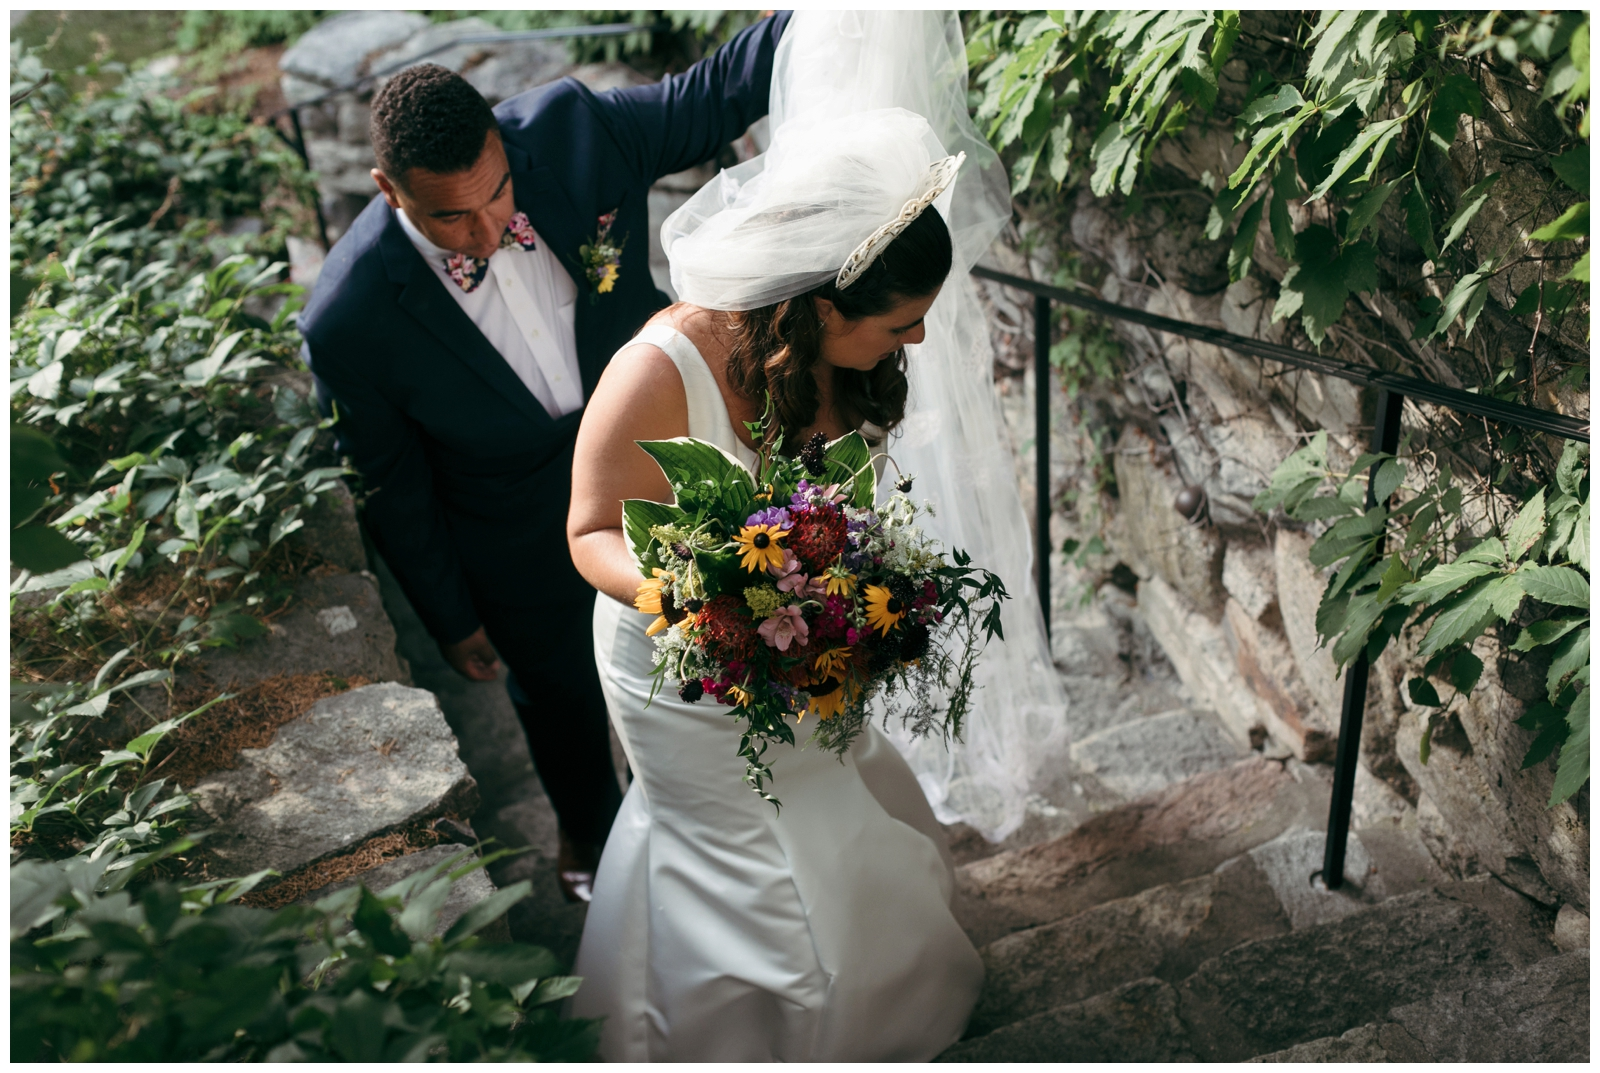 Bailey-Q-Photo-Connors-Center-Wedding-Boston-Wedding-Photographer-066.jpg